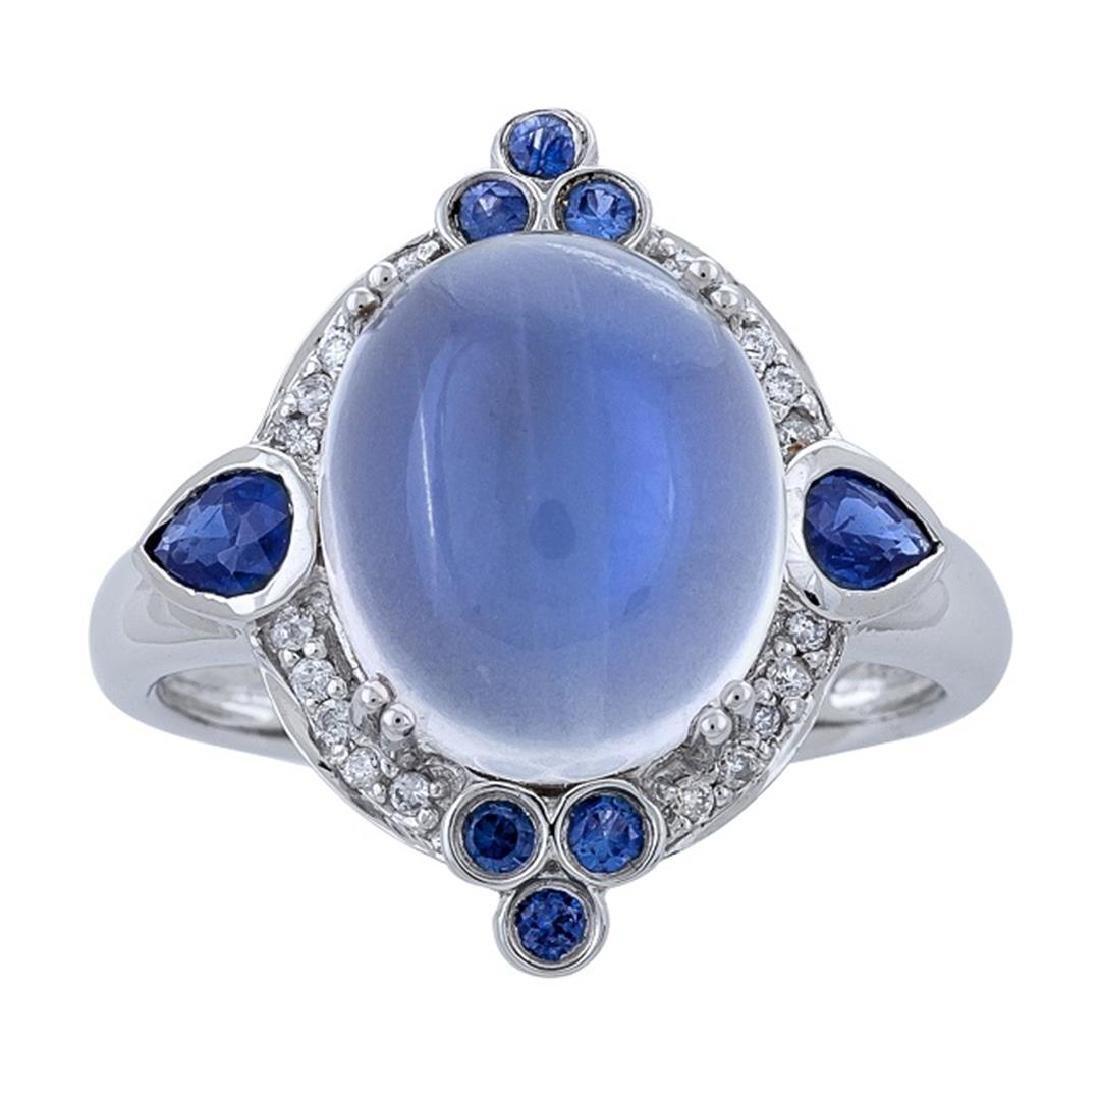 7.08 ctw Moon Stone, Blue Sapphire, and Diamond Ring -